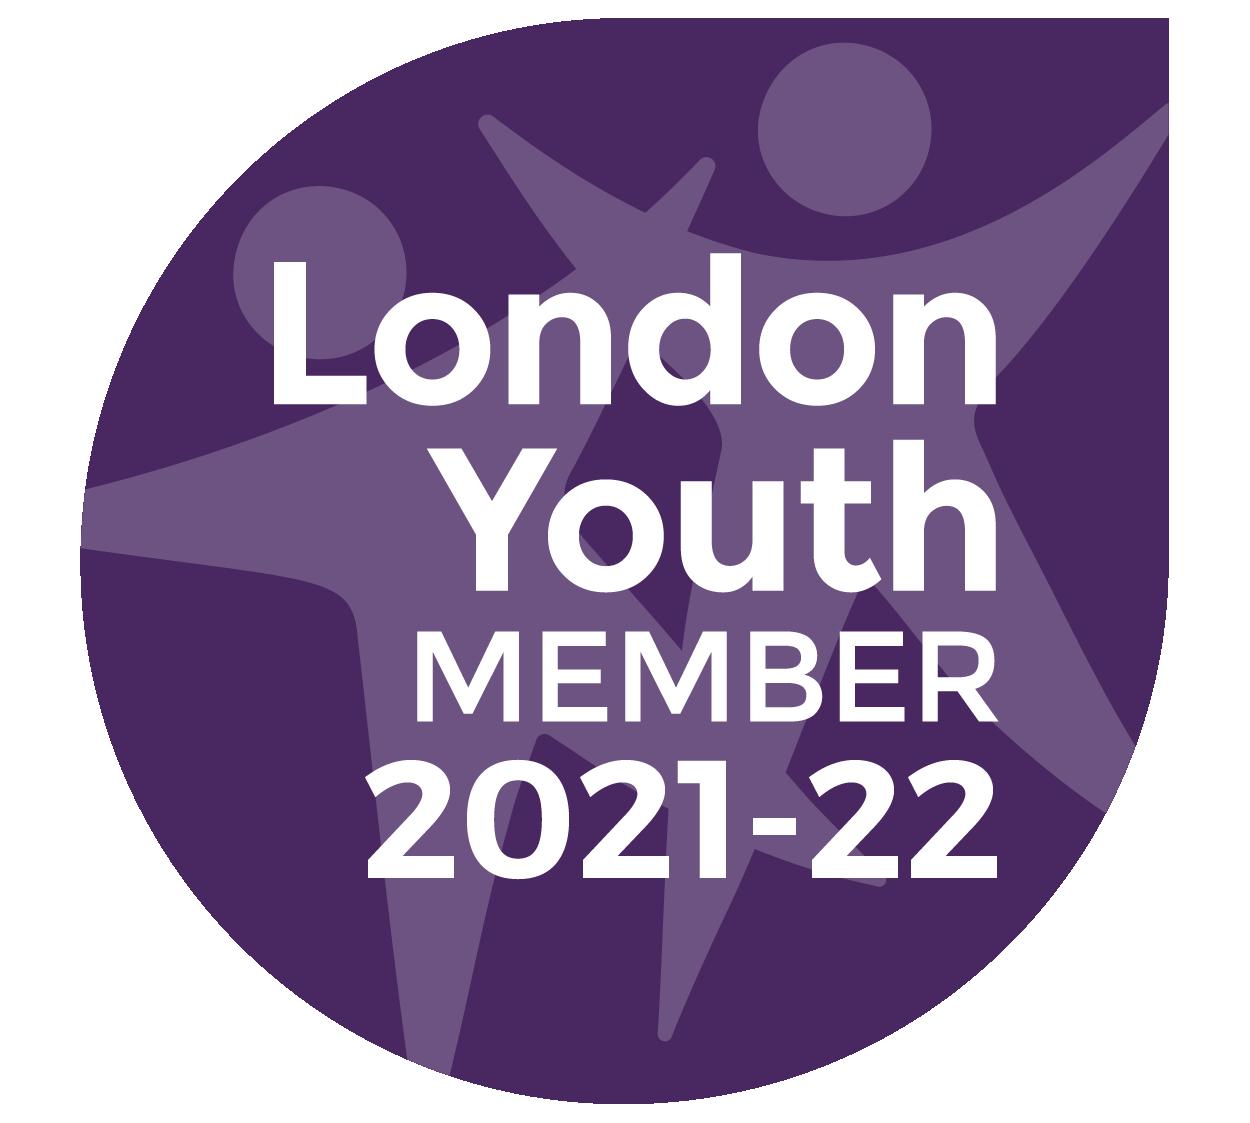 London Youth Member